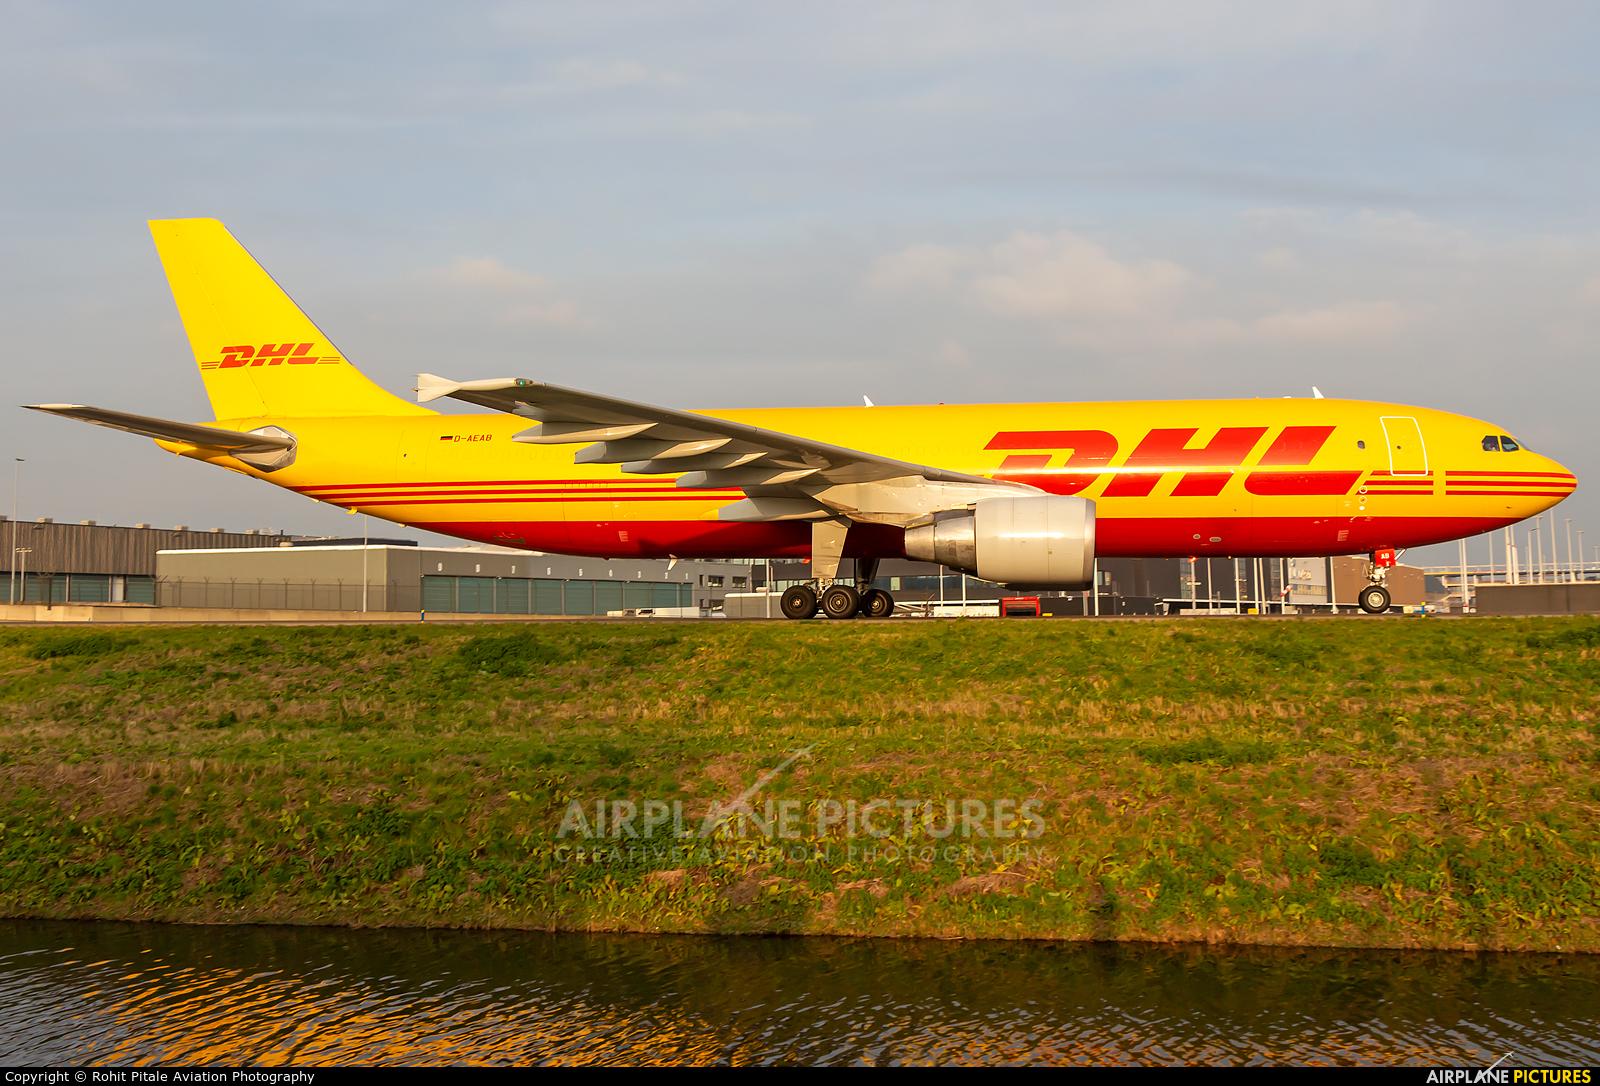 DHL Cargo D-AEAB aircraft at Amsterdam - Schiphol